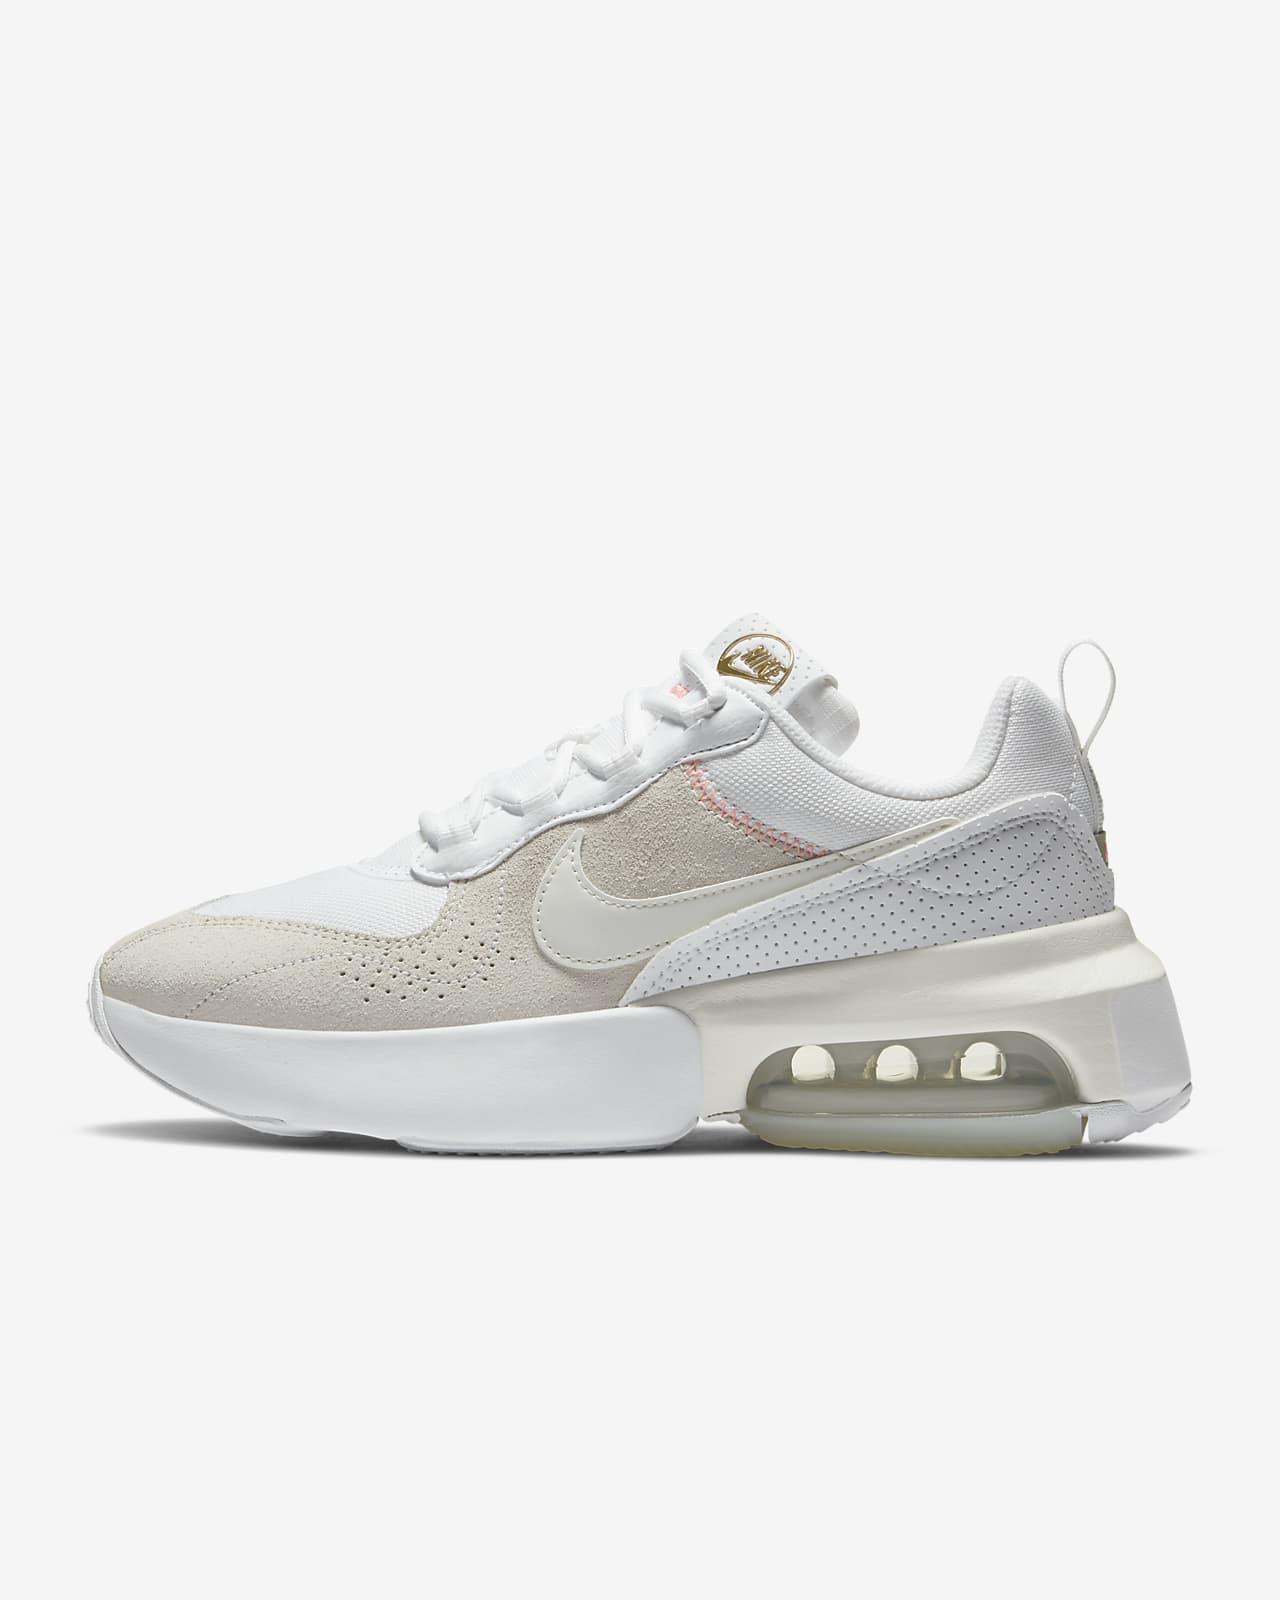 Nike Air Max Verona Damenschuh